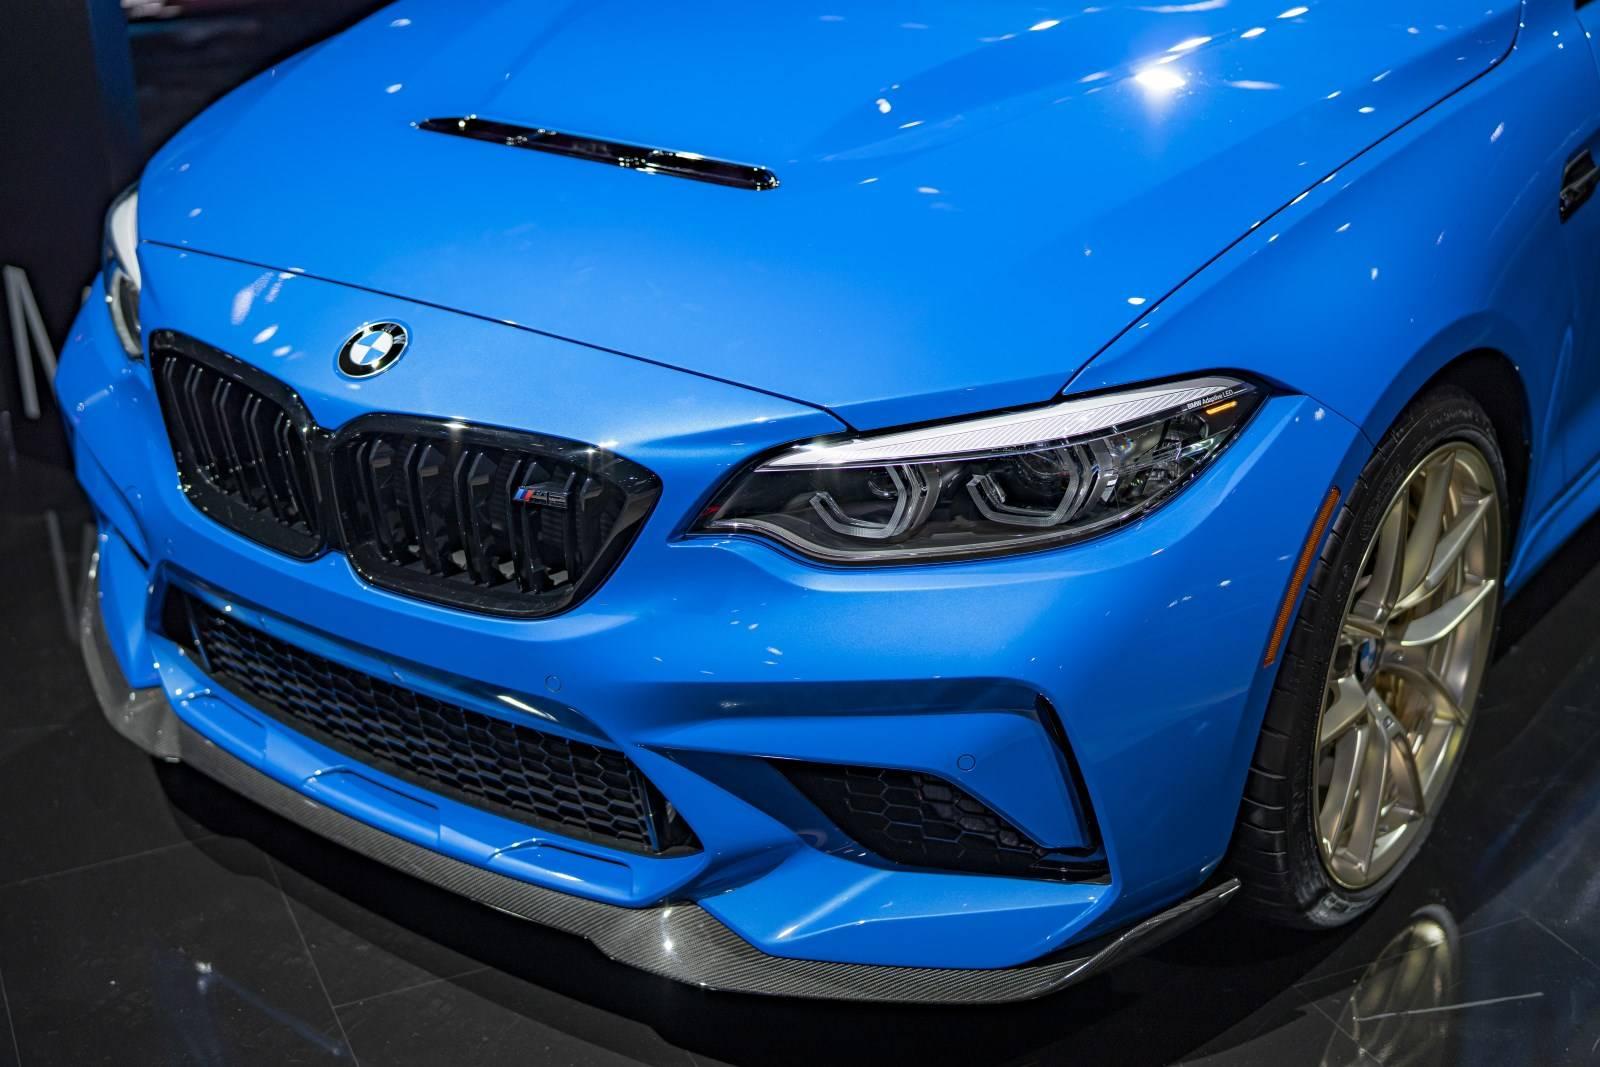 BMW M в Лос-Анджелесе: BMW M8 Gran Coupe иBMW M2 CS 3